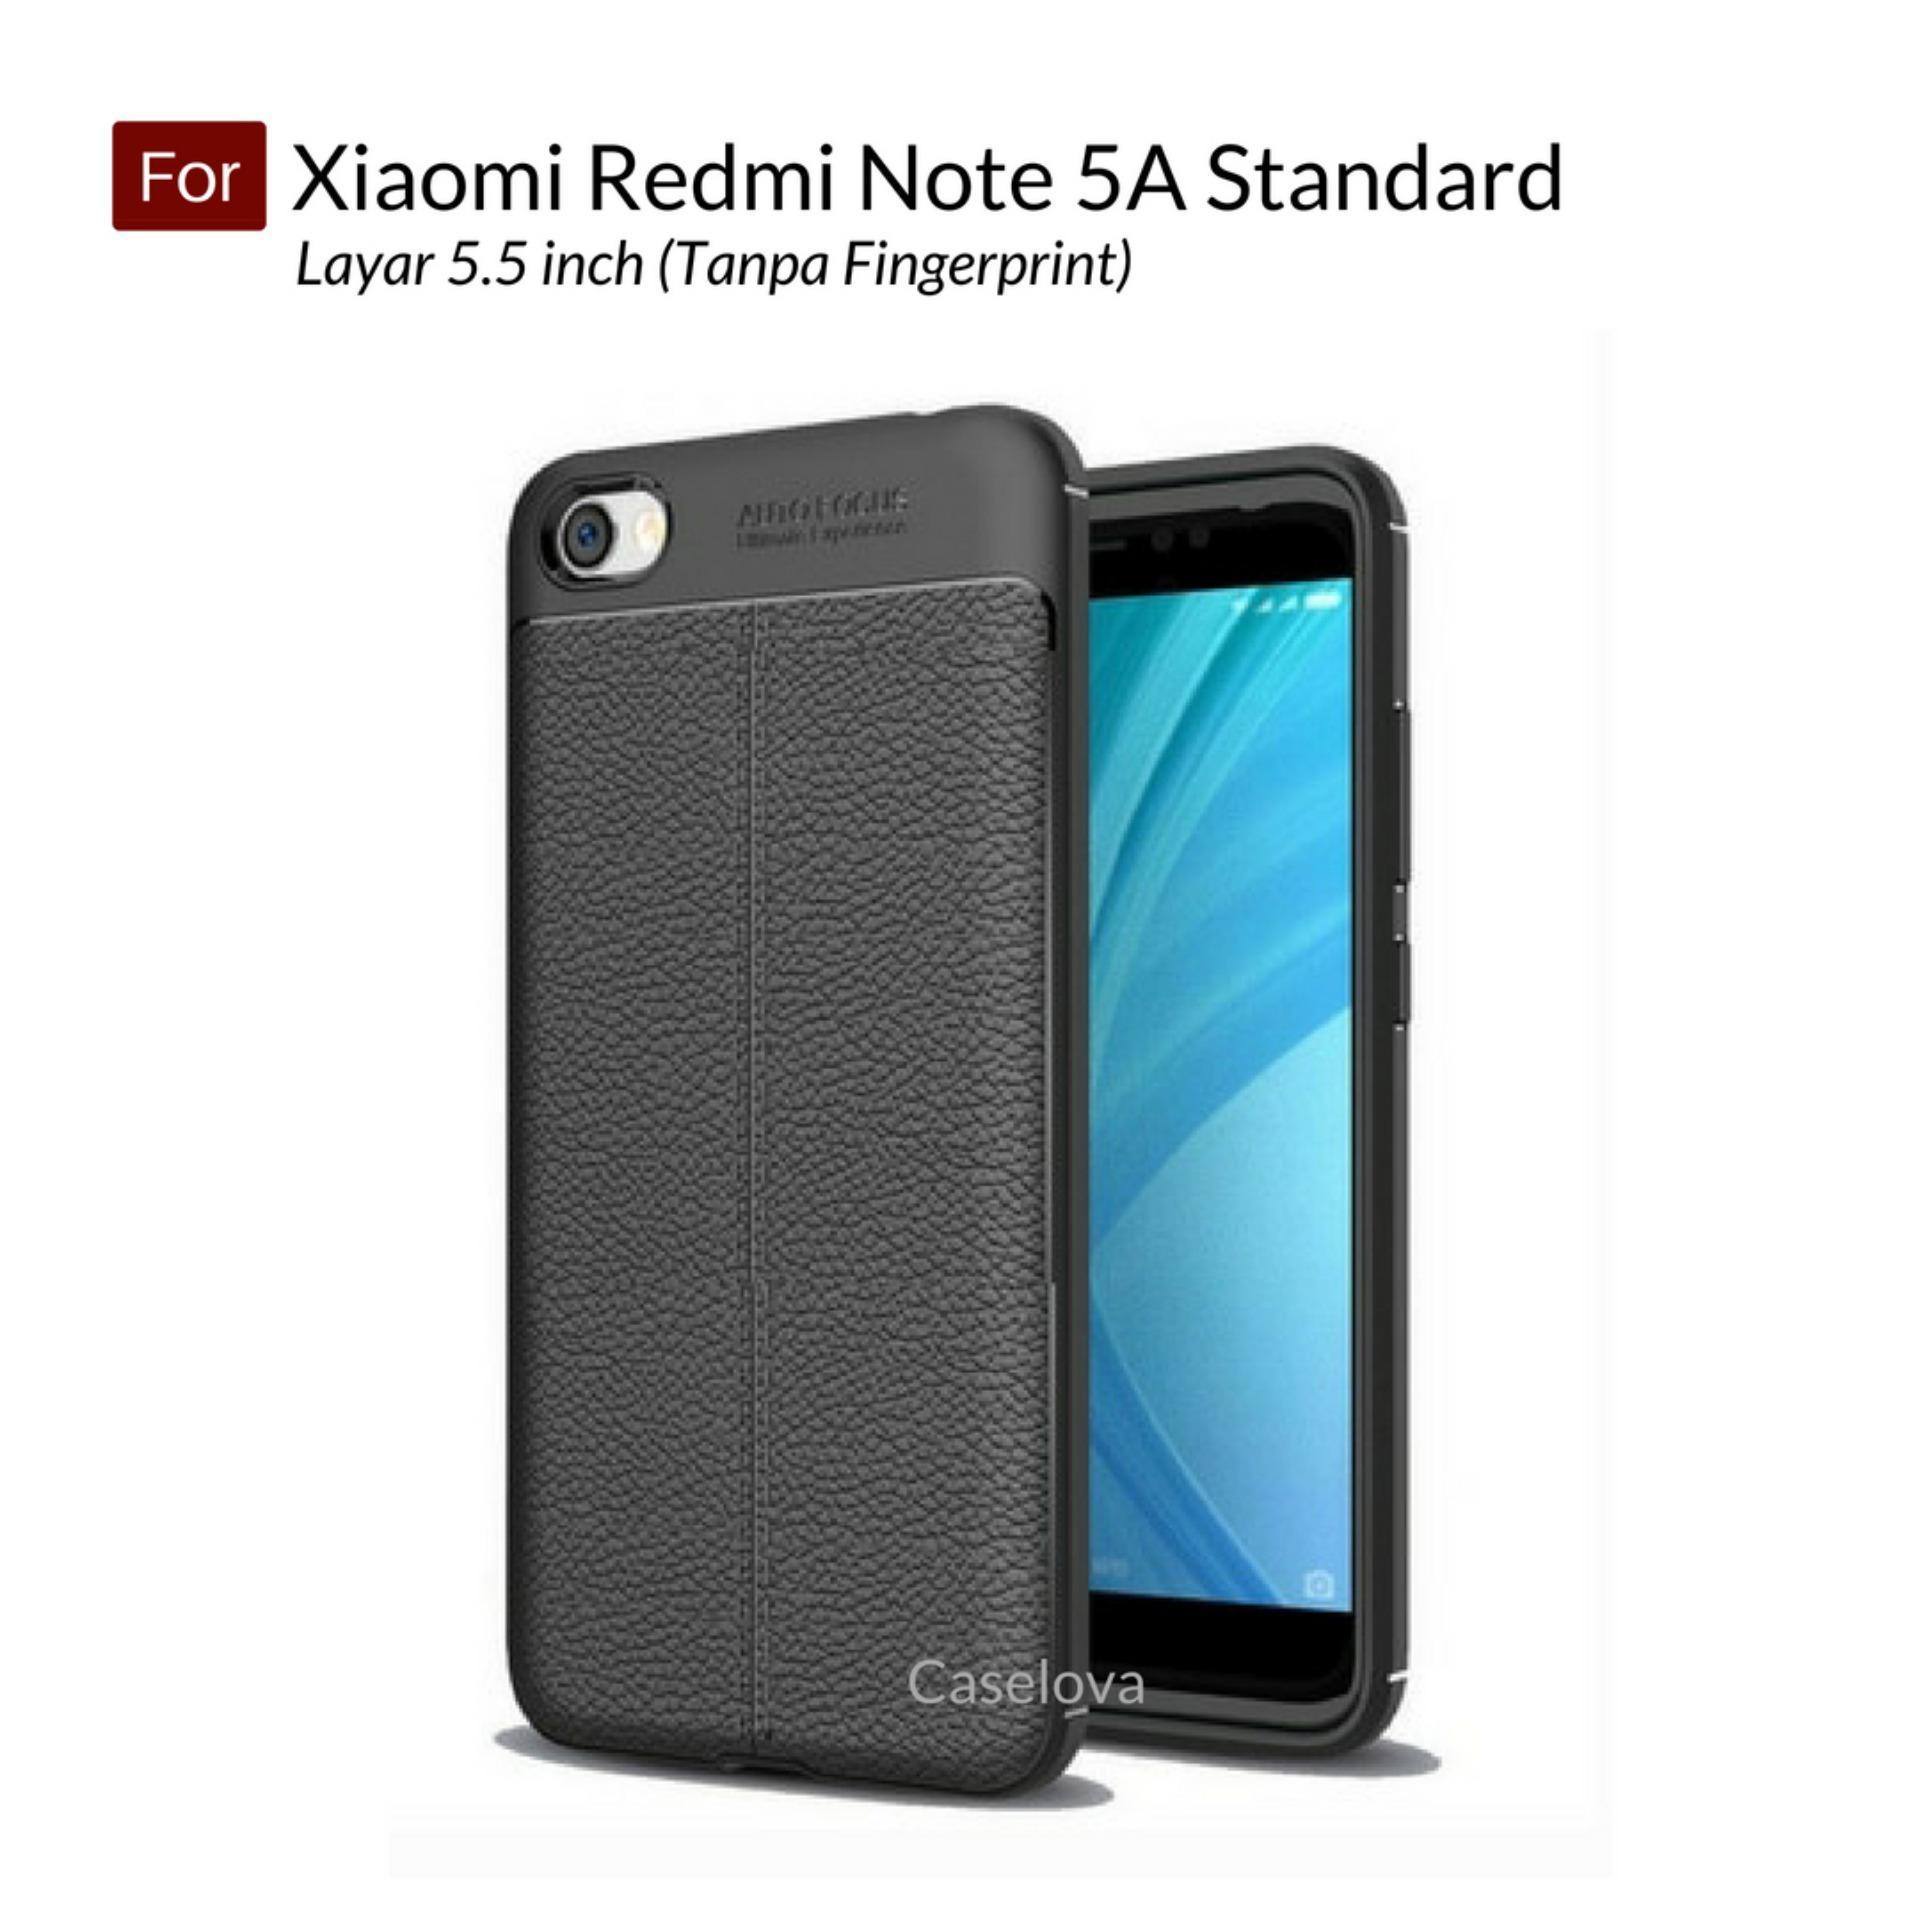 Rp 20.900. Caselova Ultimate Experience Shockproof Premium Quality Hybrid Case Xiaomi Redmi Note 5A Standard ...